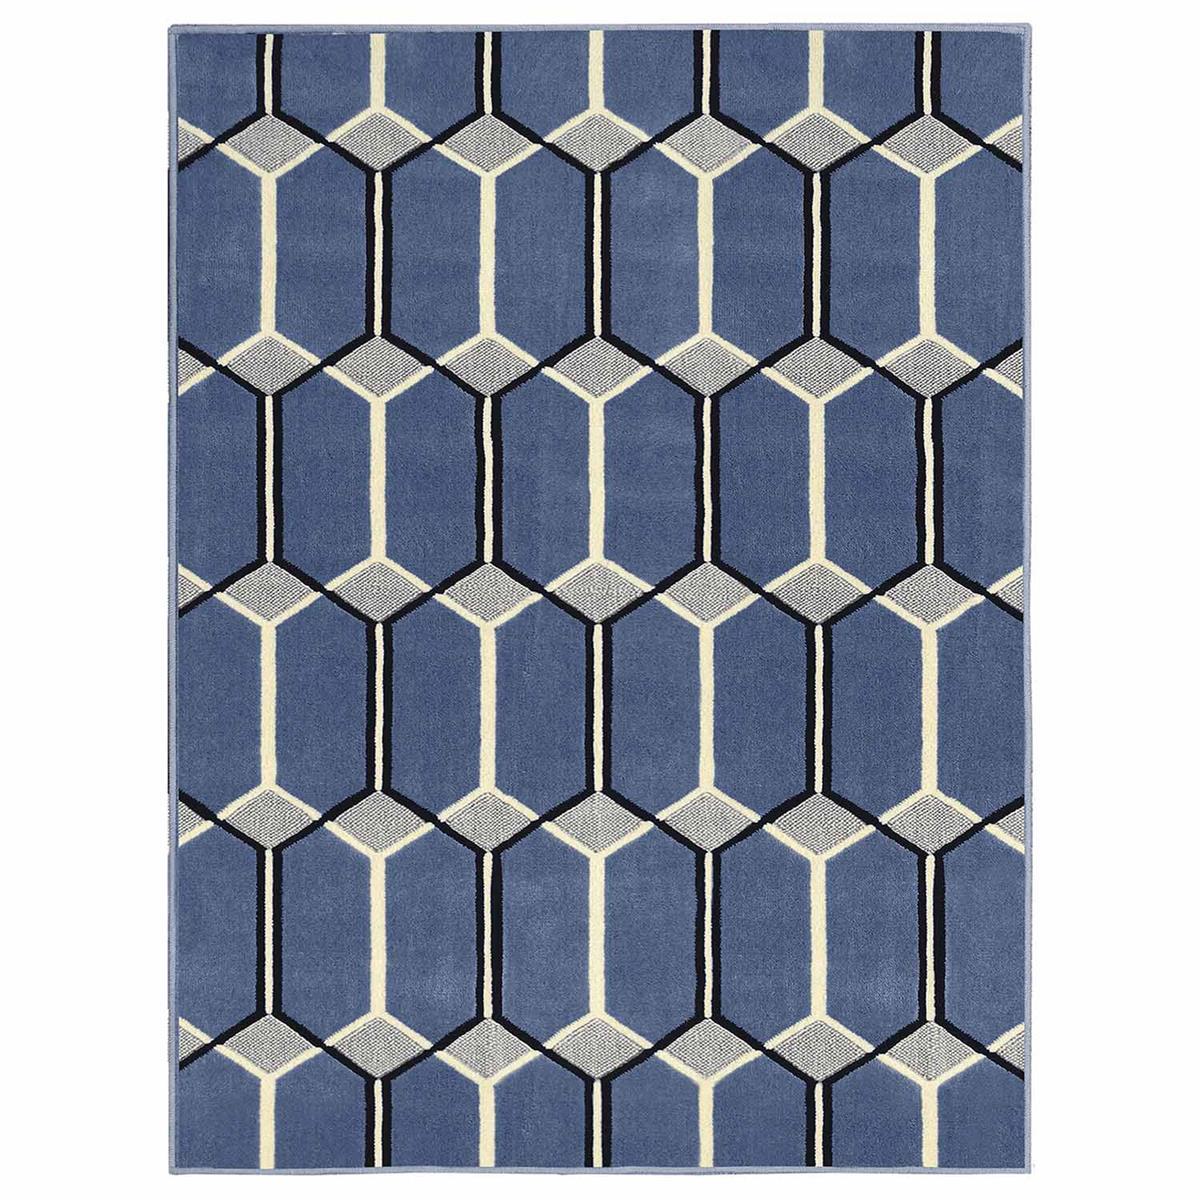 Tapete Para Sala Supreme Geom Trico 200x290cm Azul S O Carlos  -> Tapetes Geometricos Sala